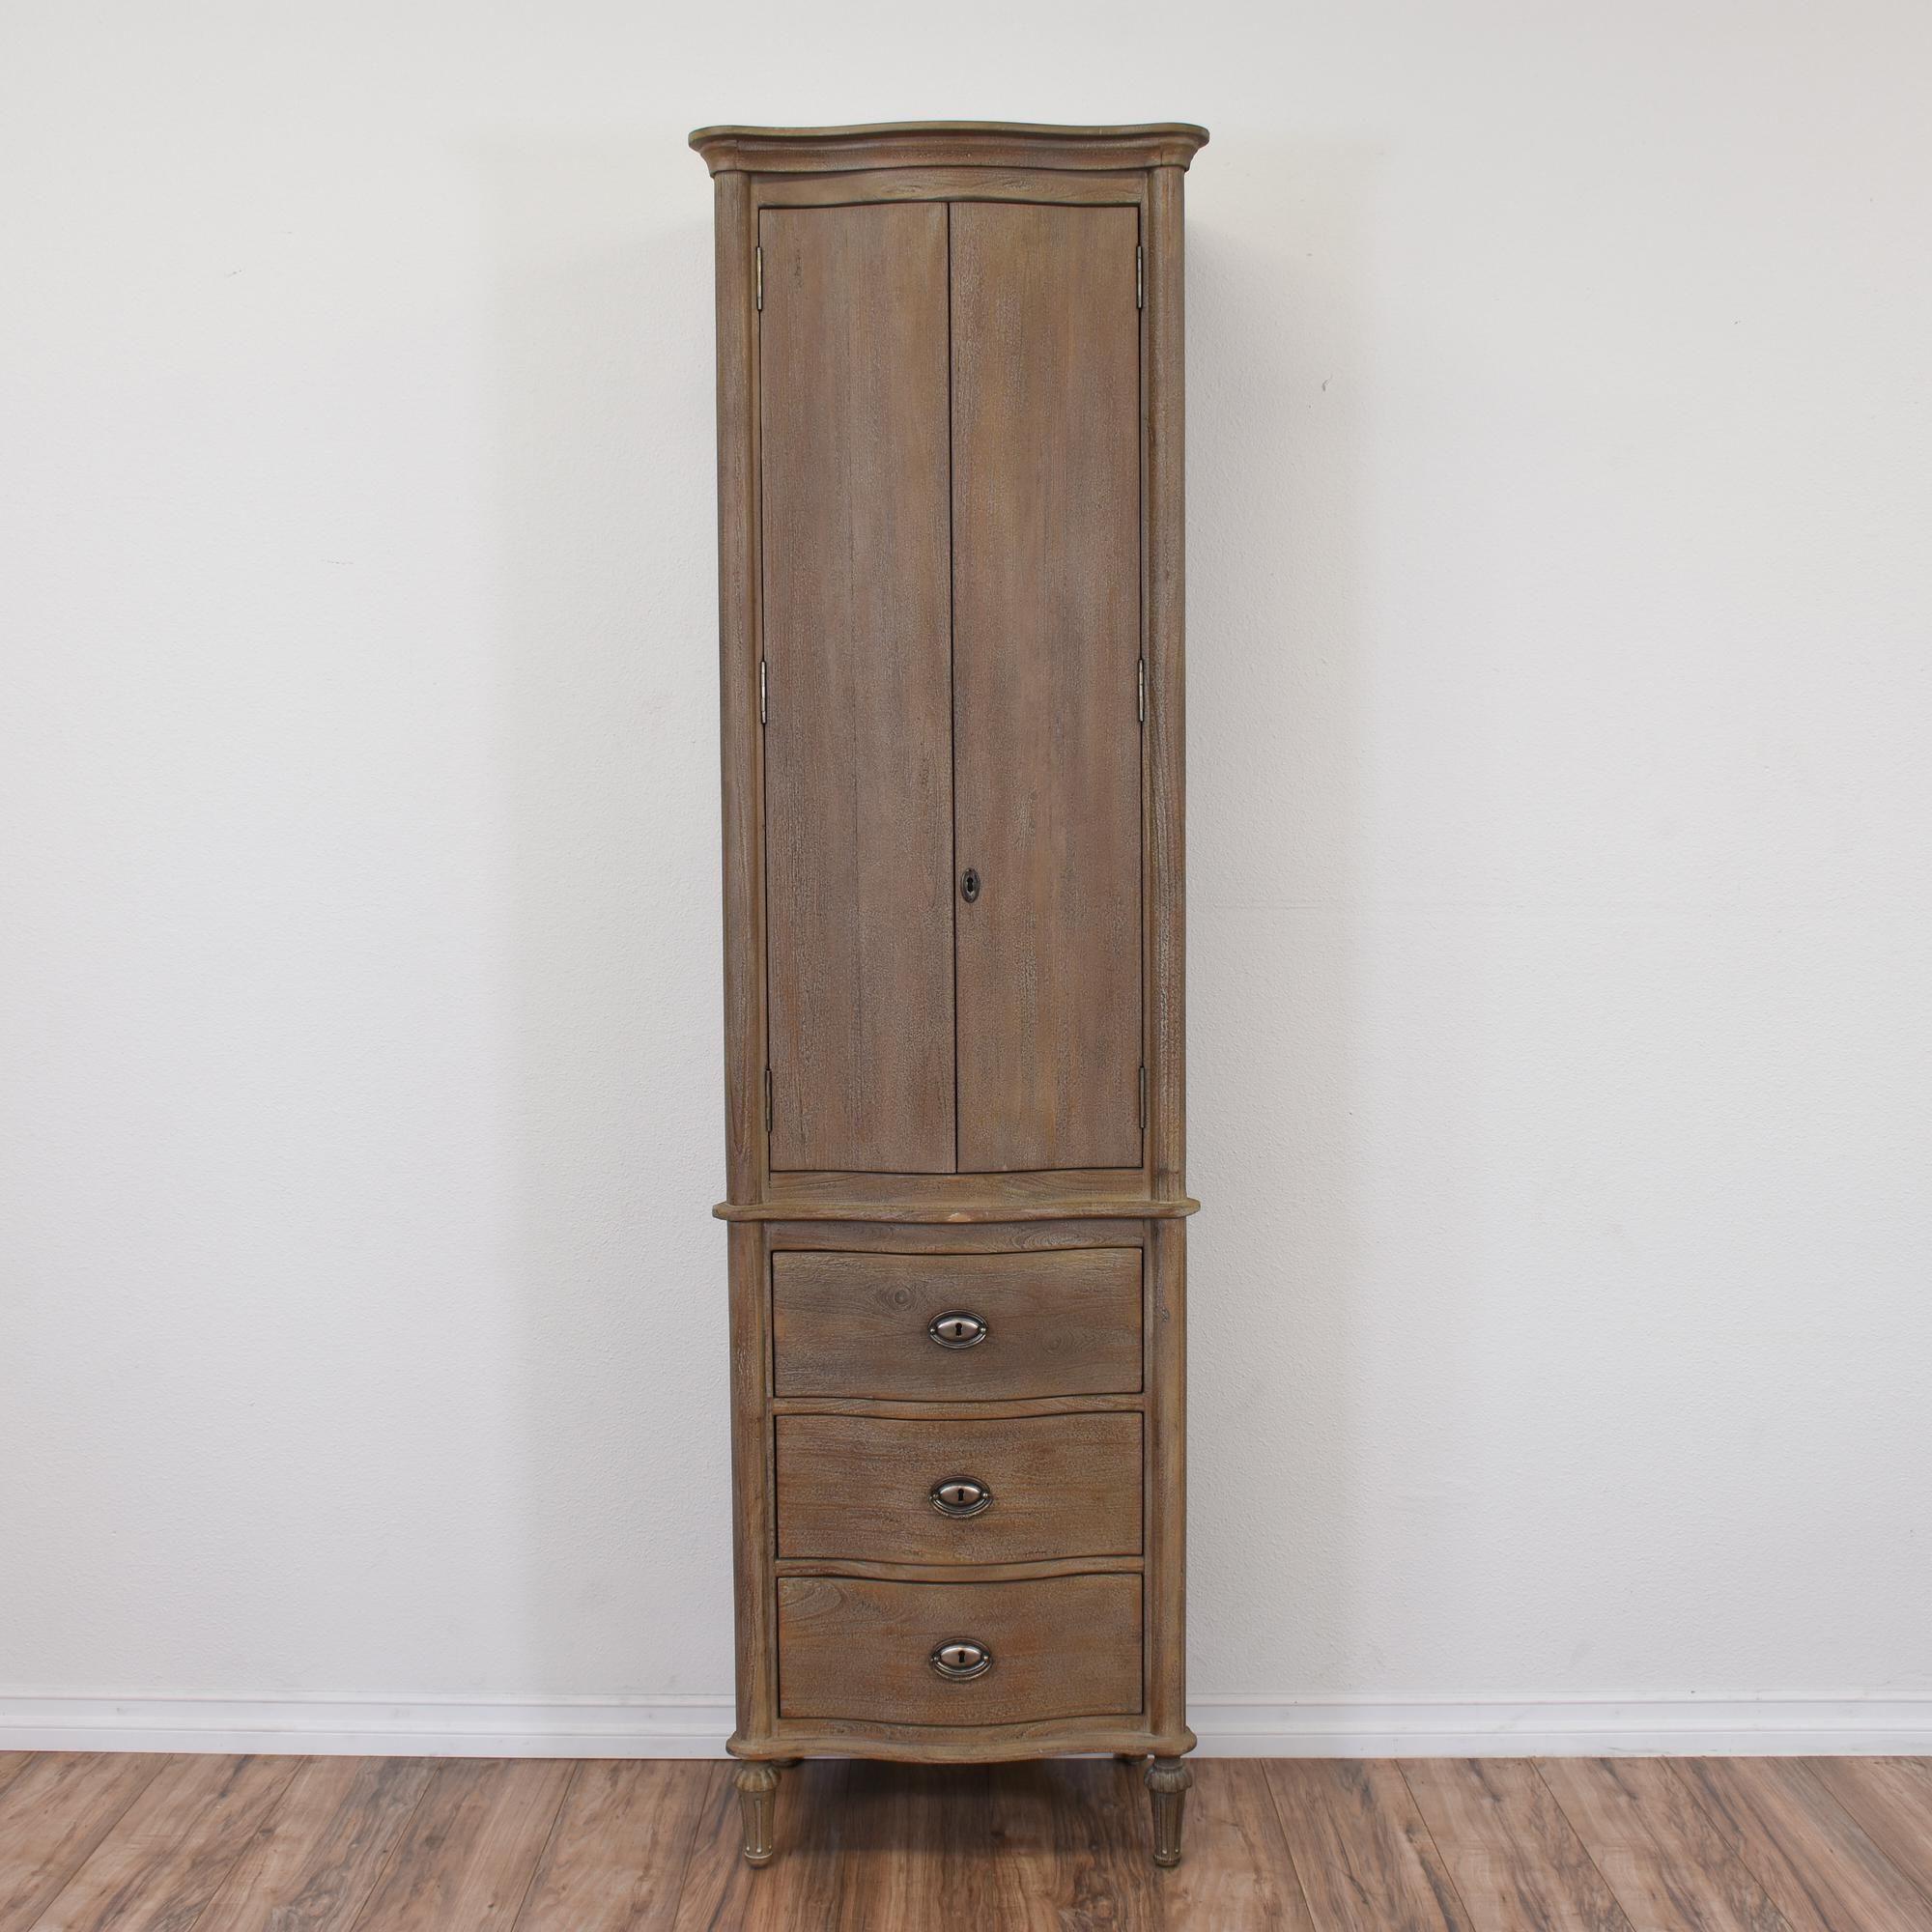 Your home improvements refference solid wood wardrobe closet -  Restoration Hardware Tall Narrow Wardrobe